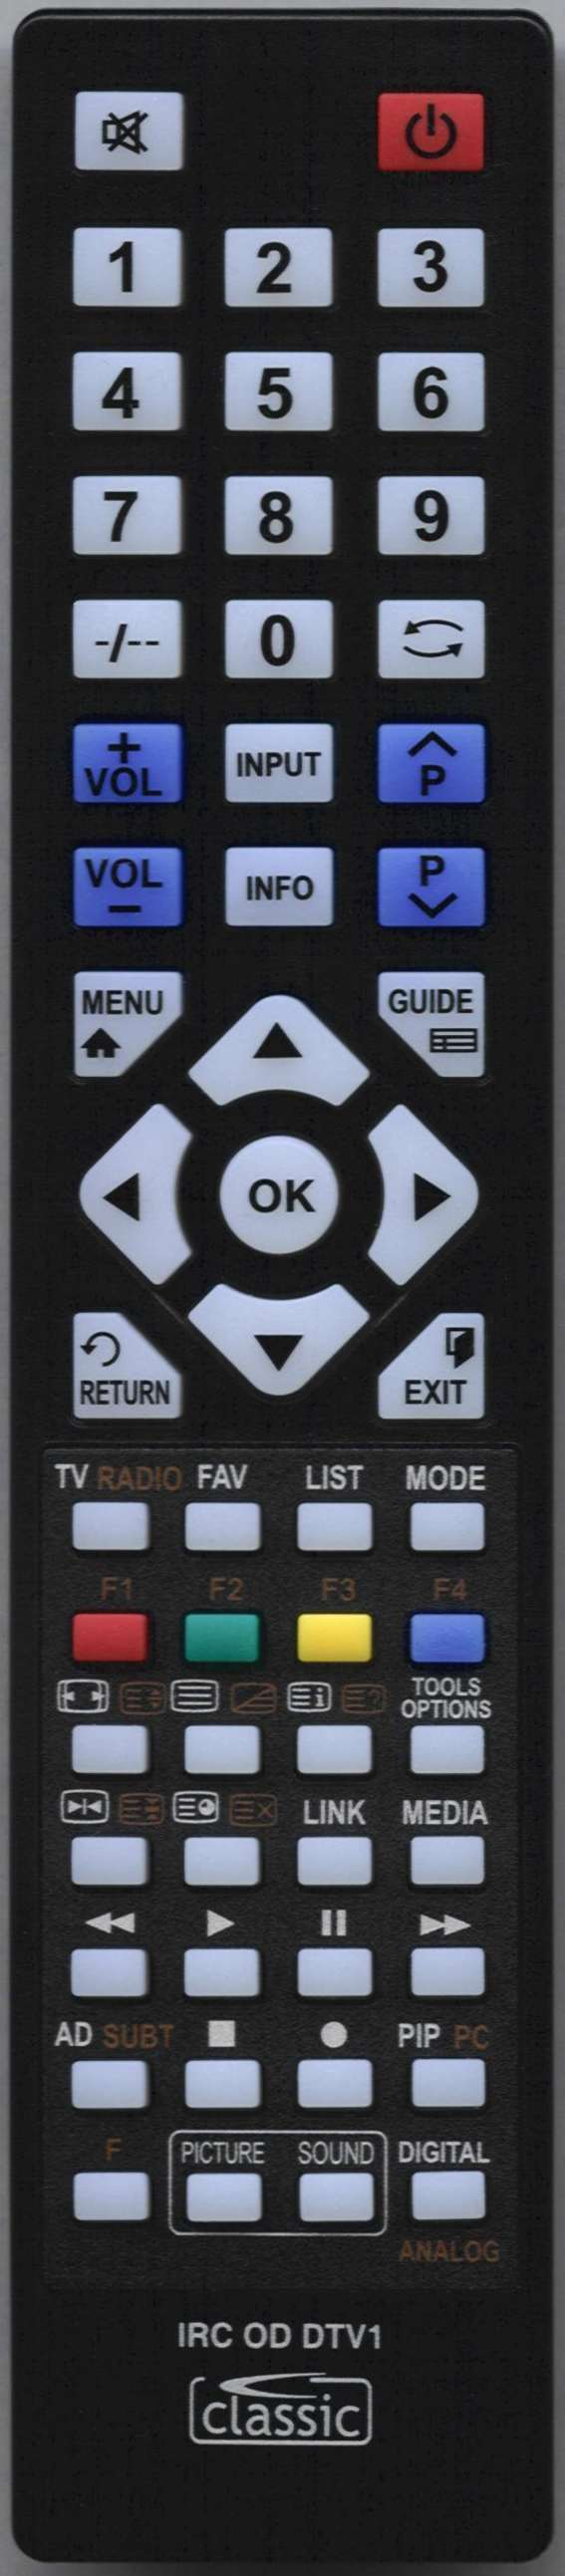 Baird TI5509DLEDBH Remote Control